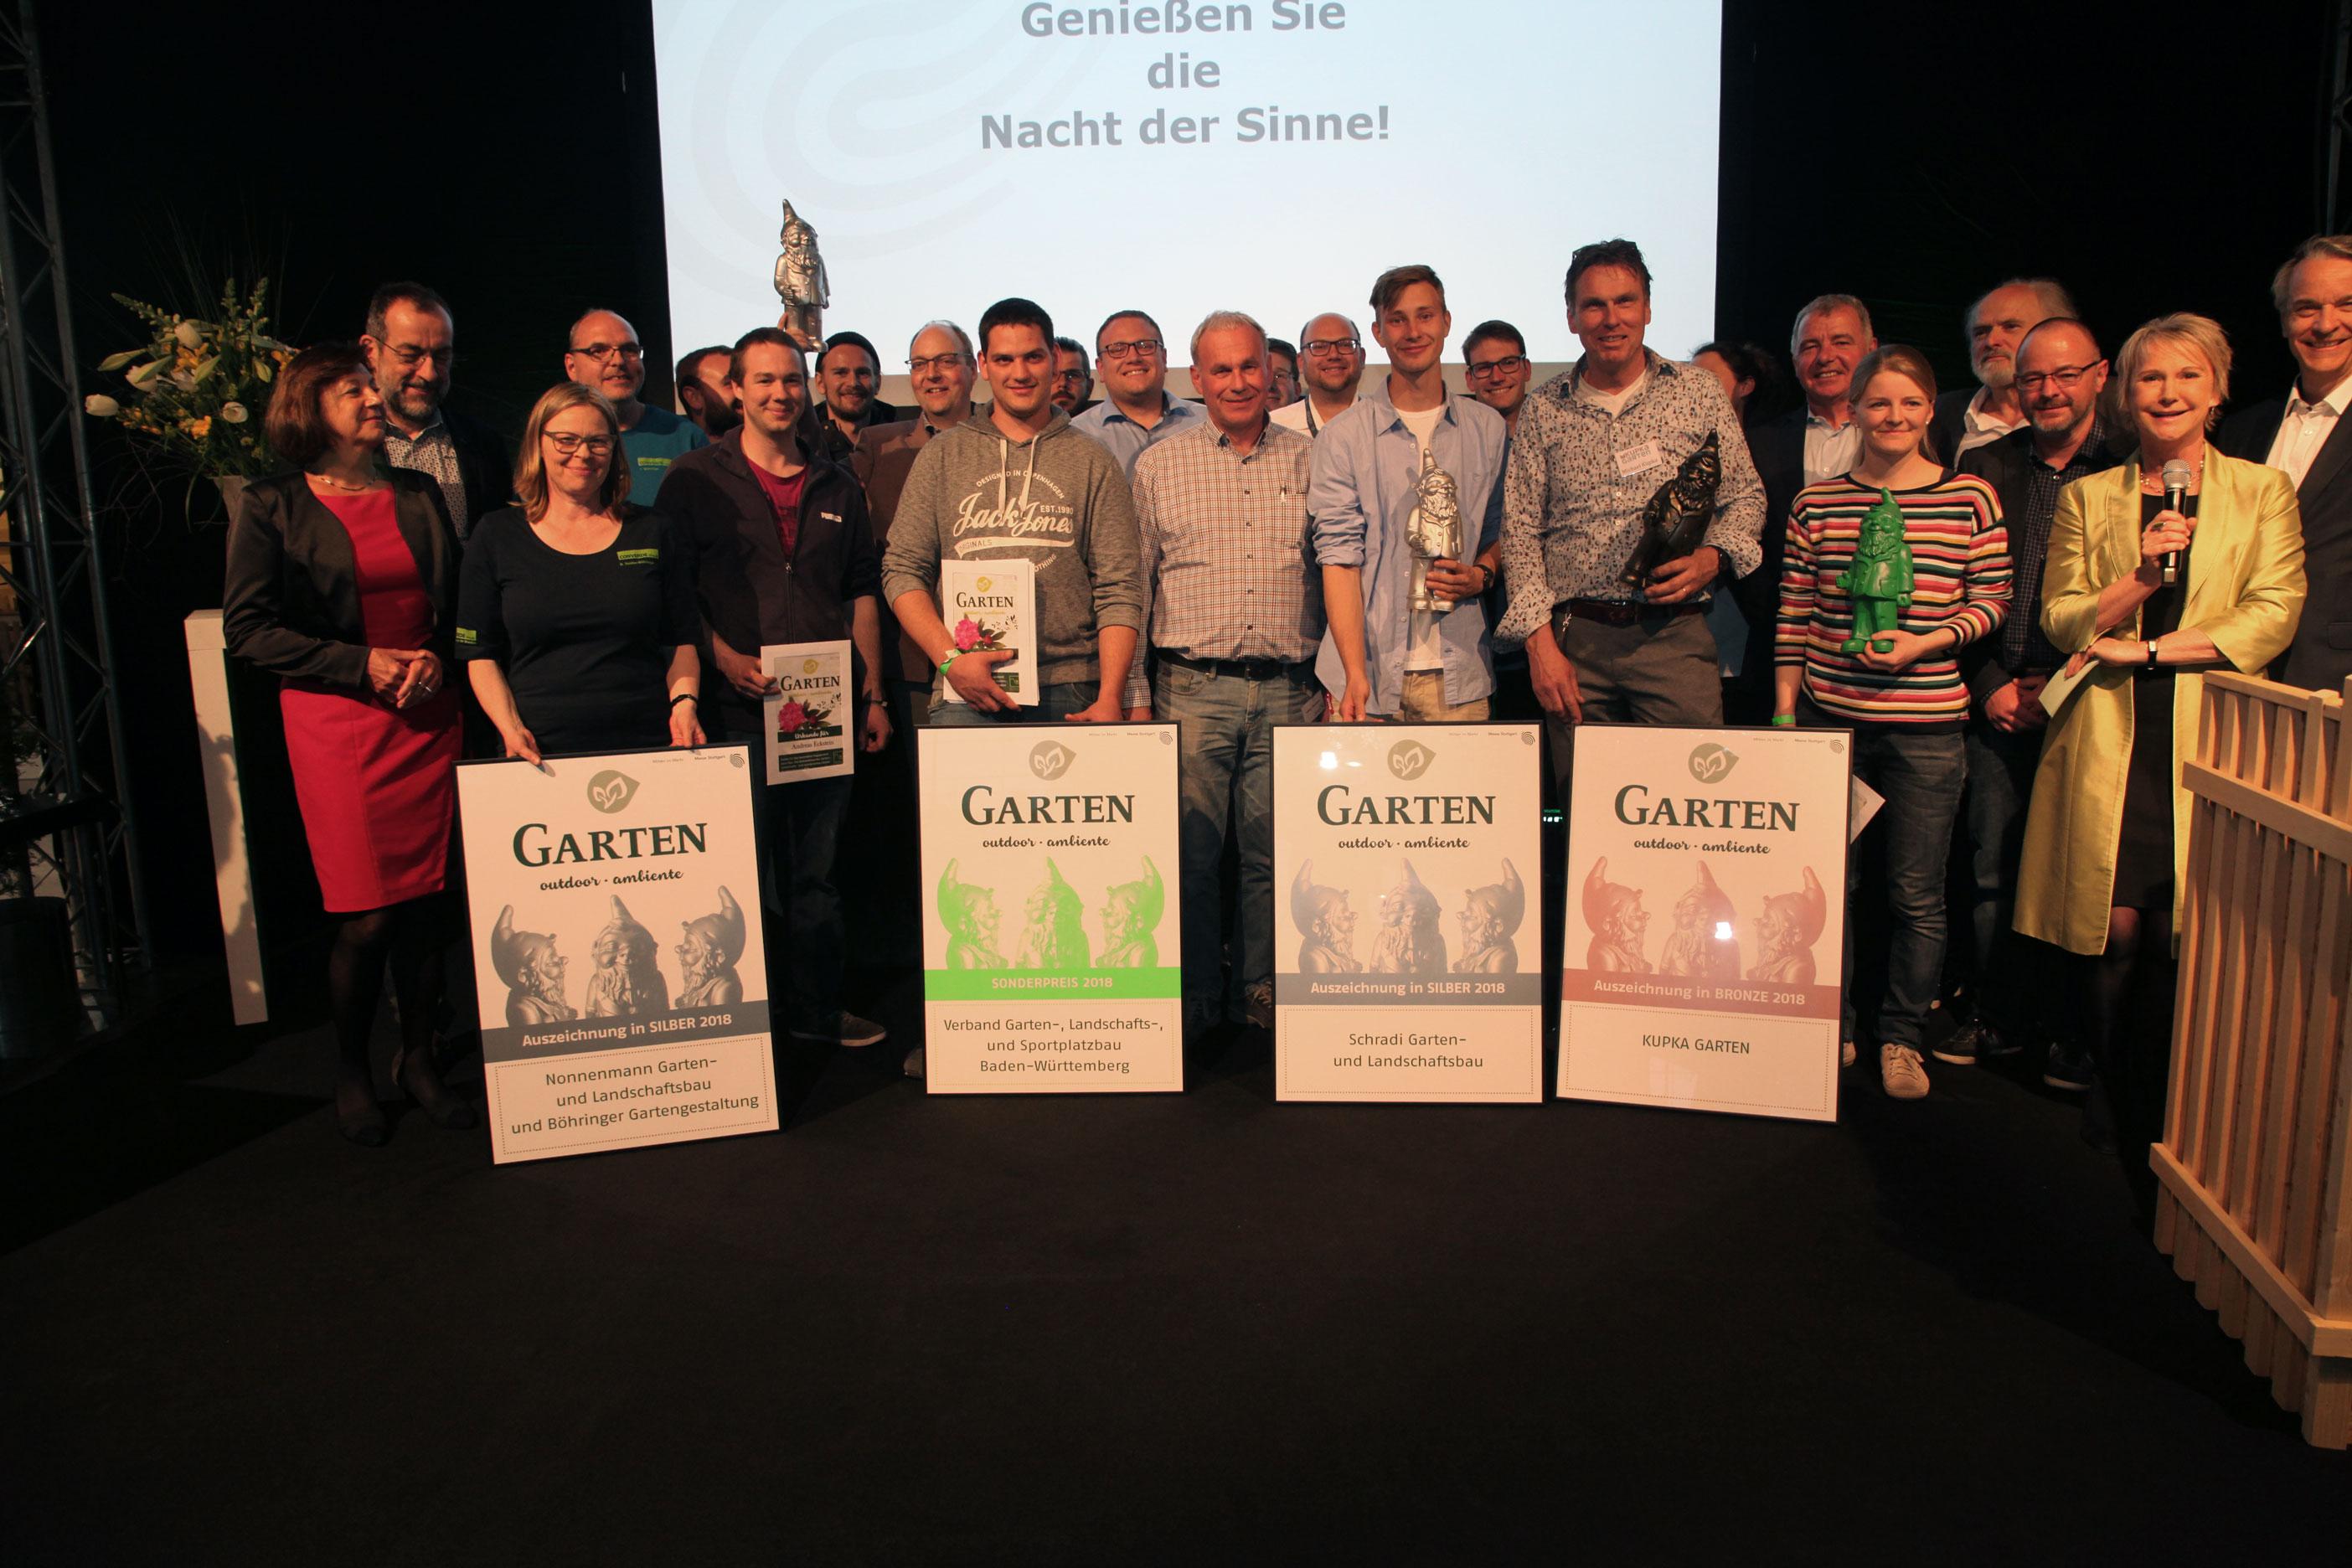 Moderation der Gartenpreisverleihung 2018  bei der 'garten-outdoor-ambiente', Messe Stuttgart, April 2018